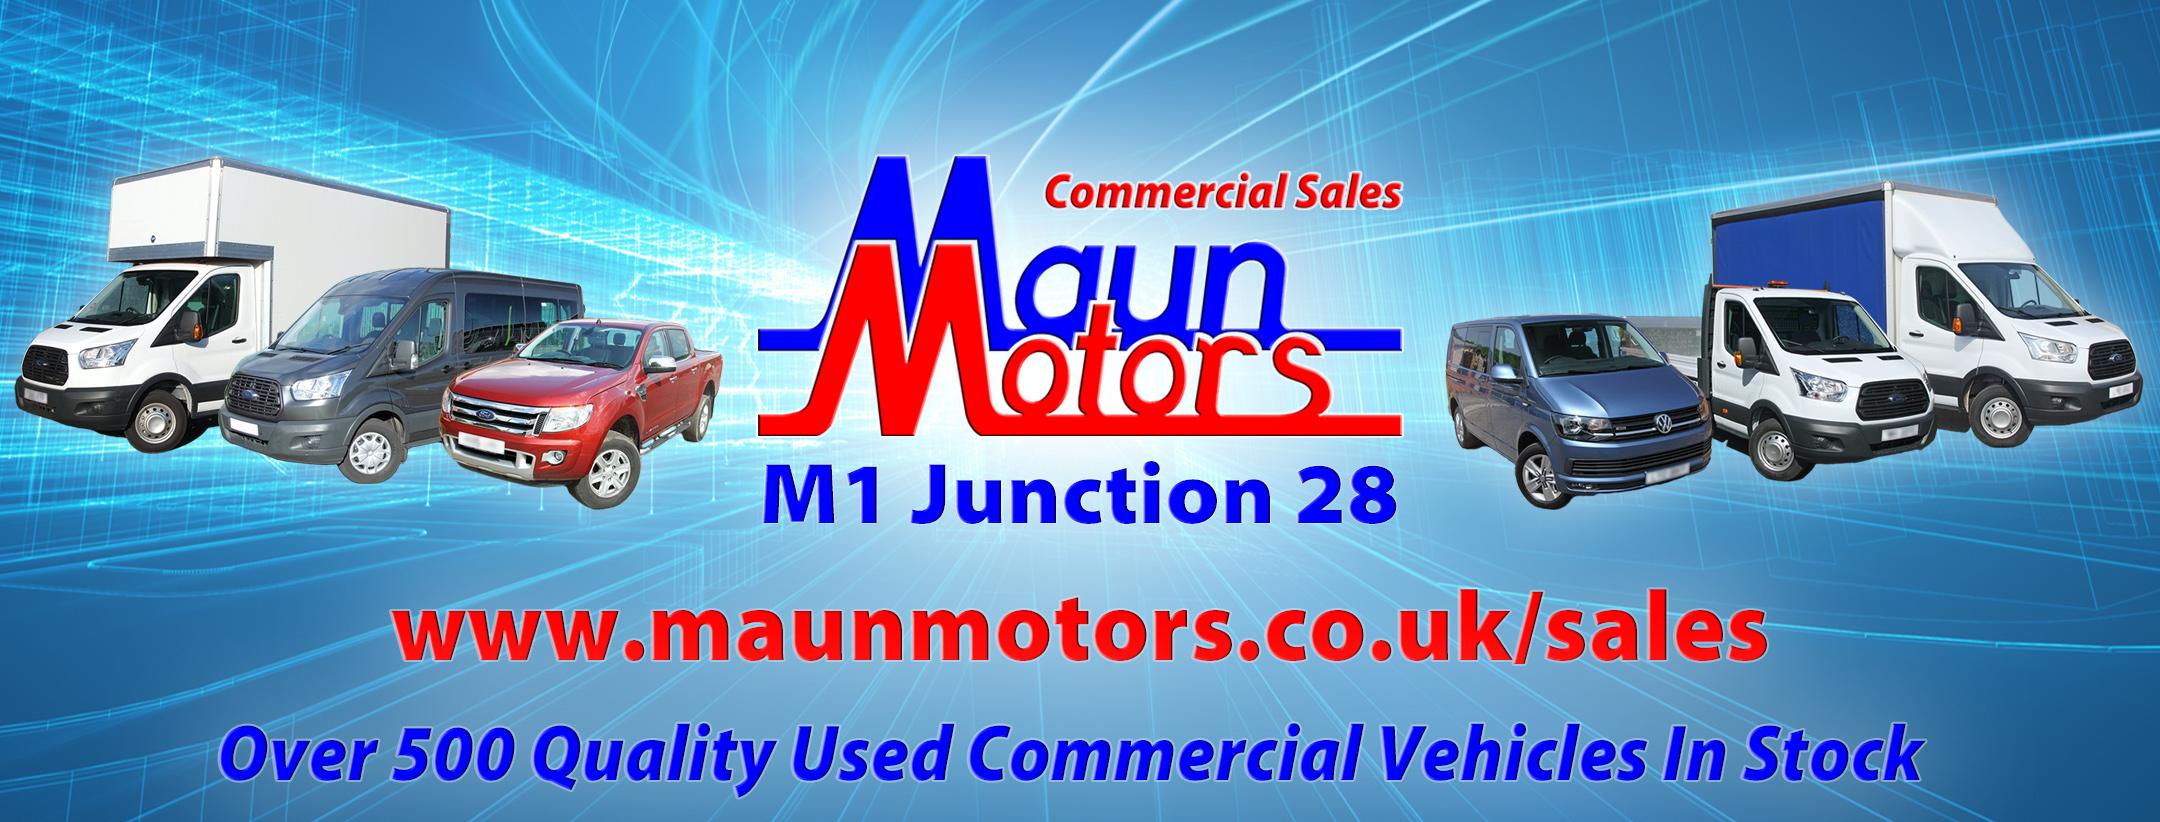 Maun Motors Commercial Sales